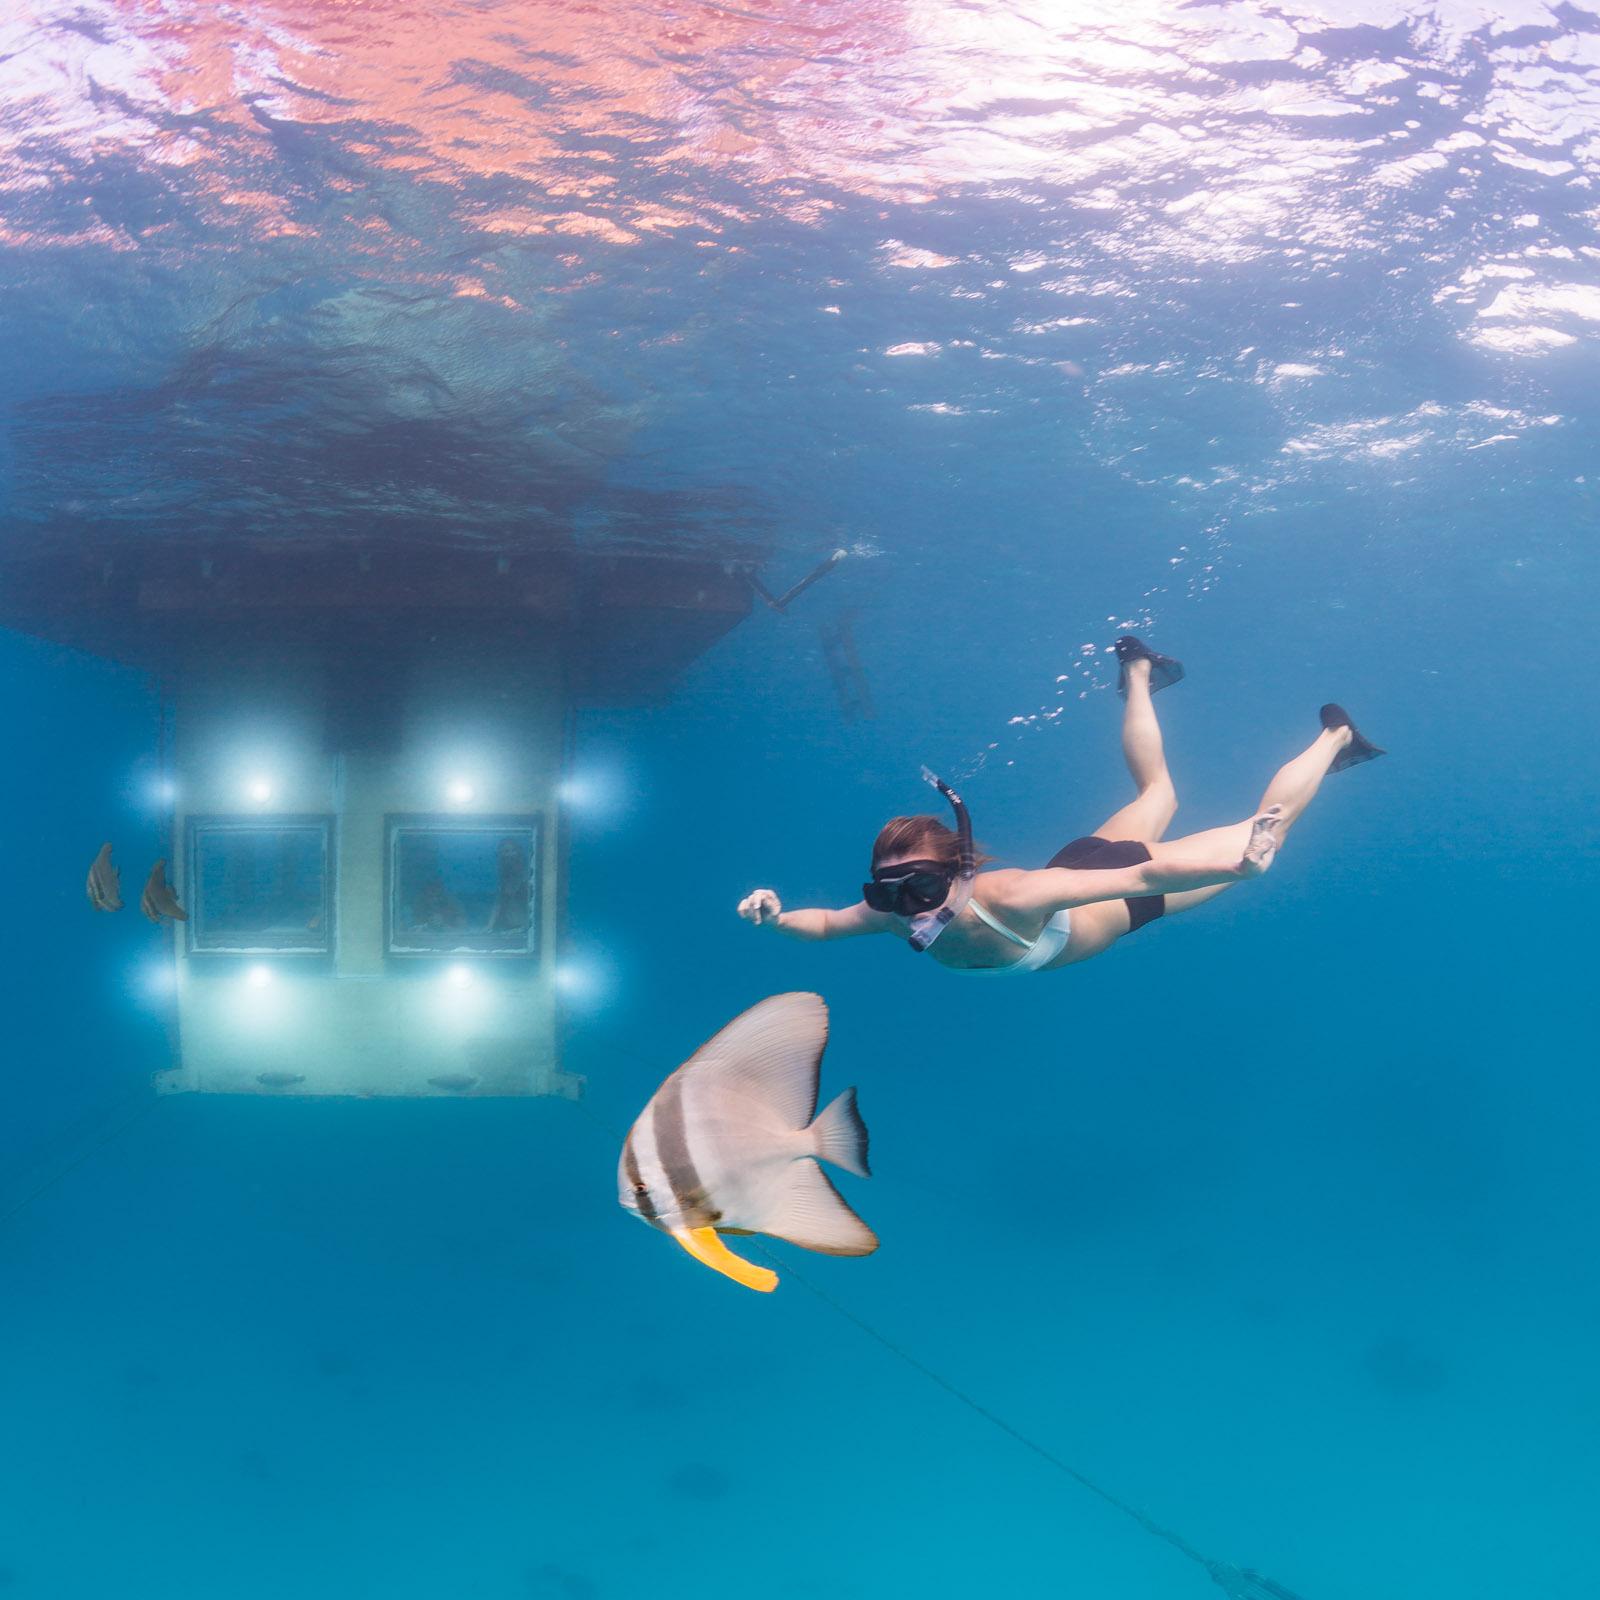 Underwater photographer - Undervattensfotograf - Manta Underwater Room - Hotel - Resort - Pemba Island, Zanzibar, Tanzania, Africa, Afrika - Orbicular batfish